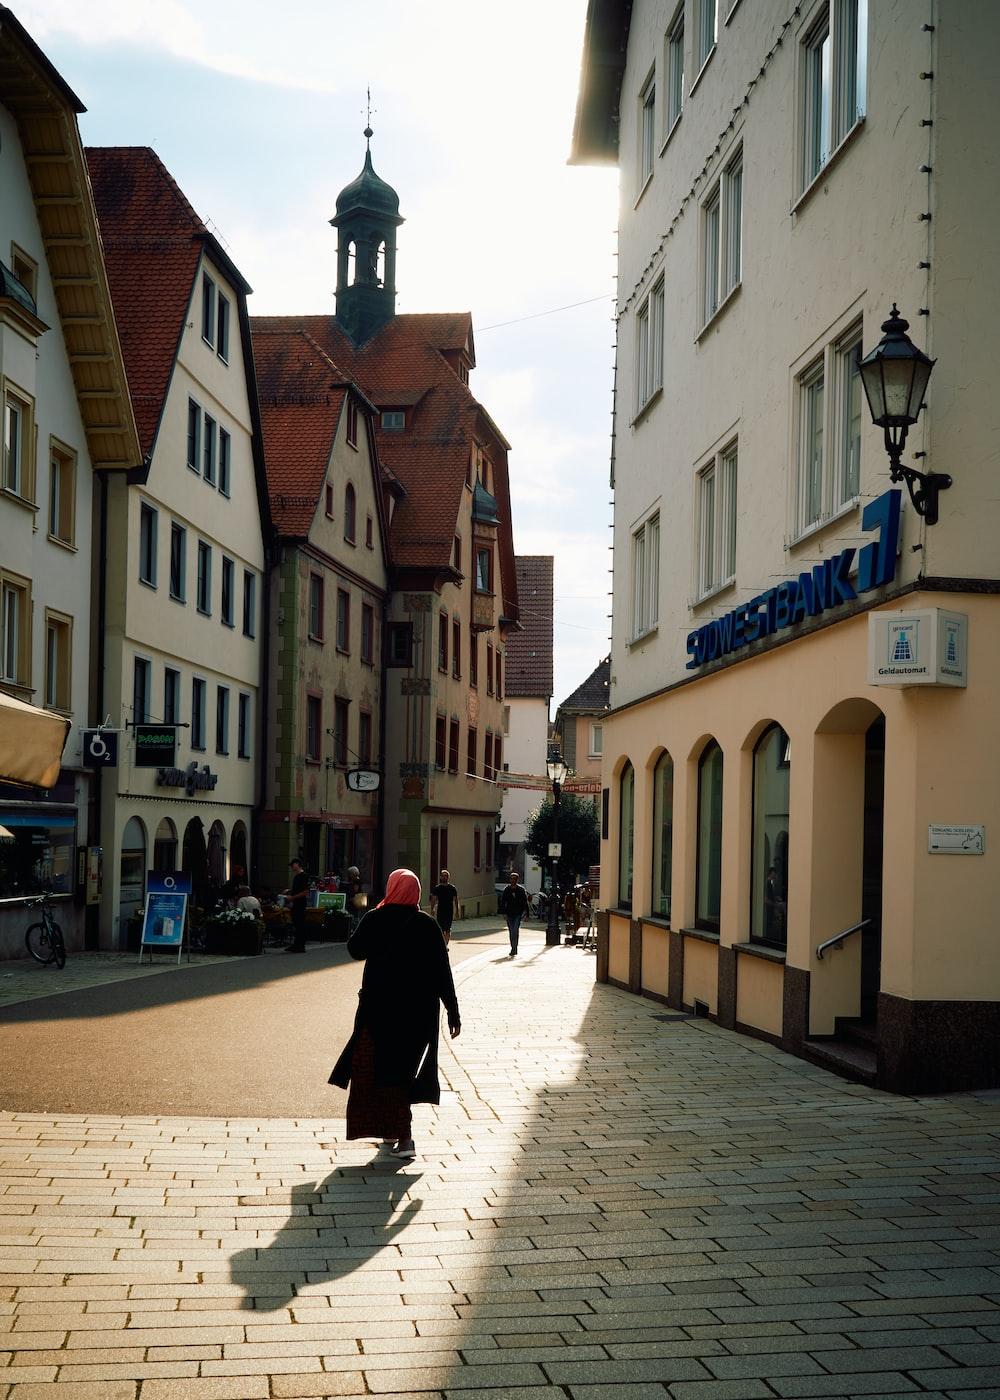 woman in black coat walking on sidewalk during daytime